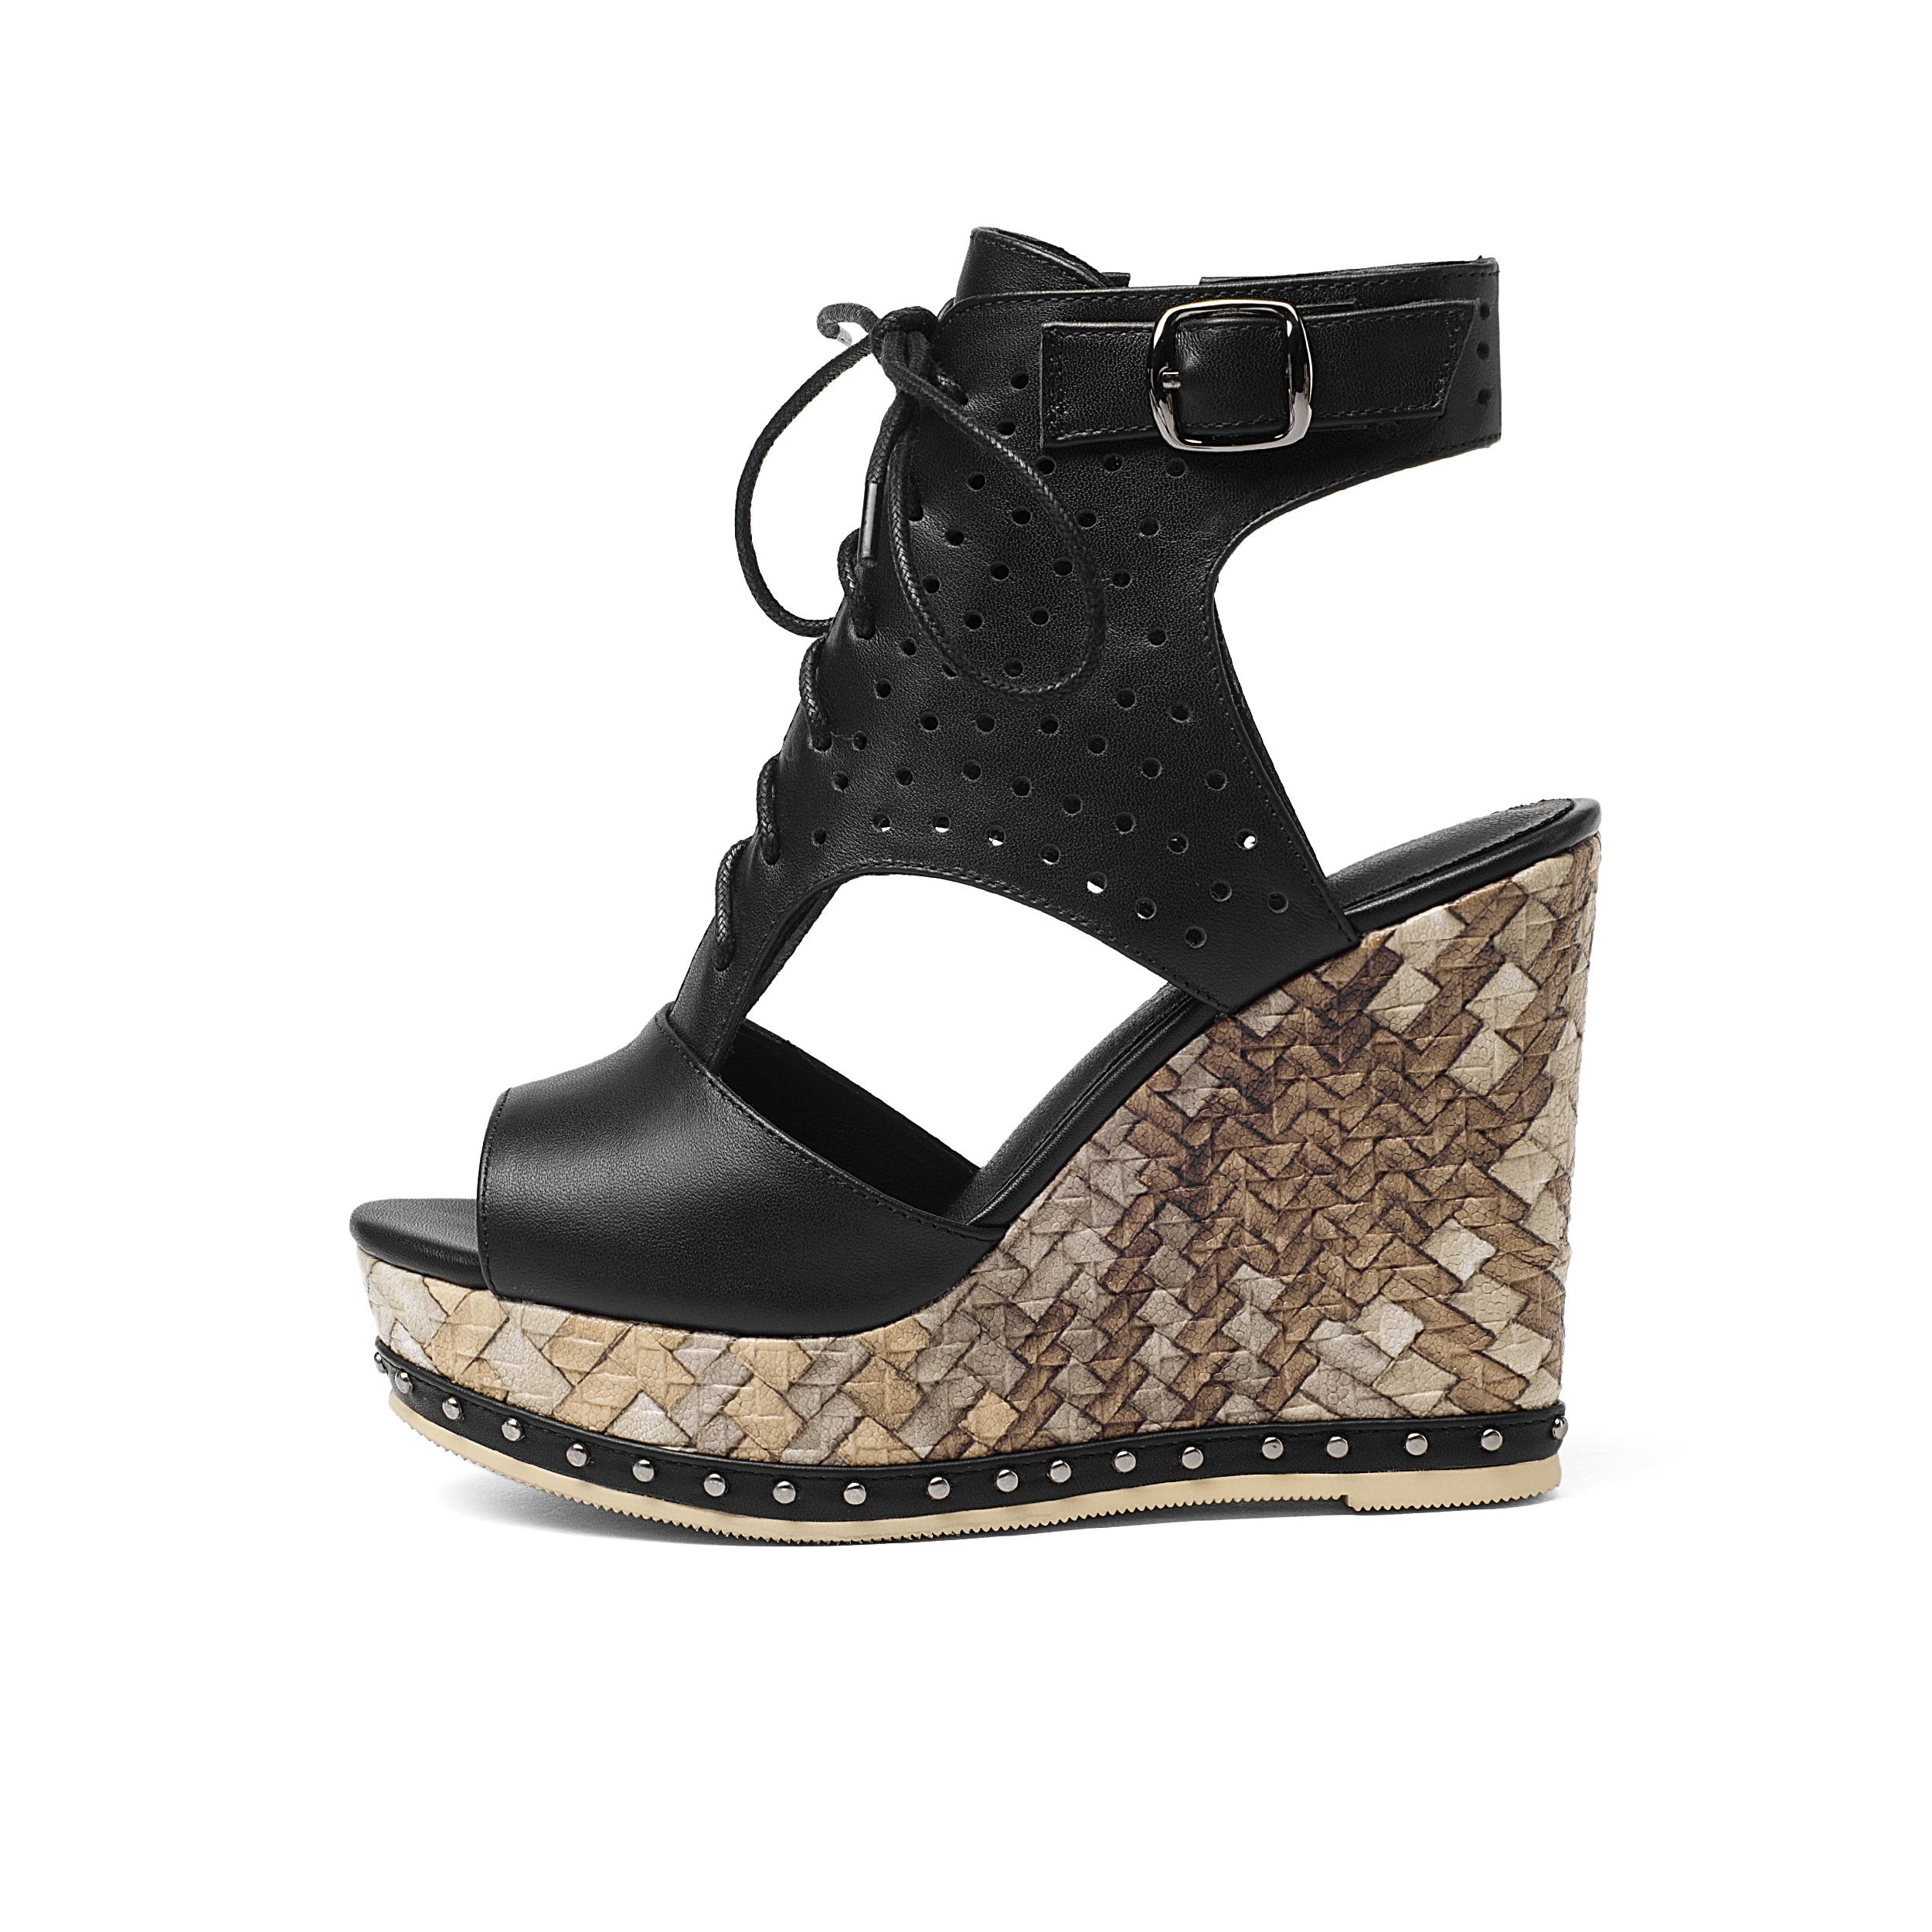 588ef5241bbe US  60 - Arden Furtado 2018 summer high heels 11cm wedges platform peep toe  ankle strap gladiator genuine leather sandals shoes for woman ...